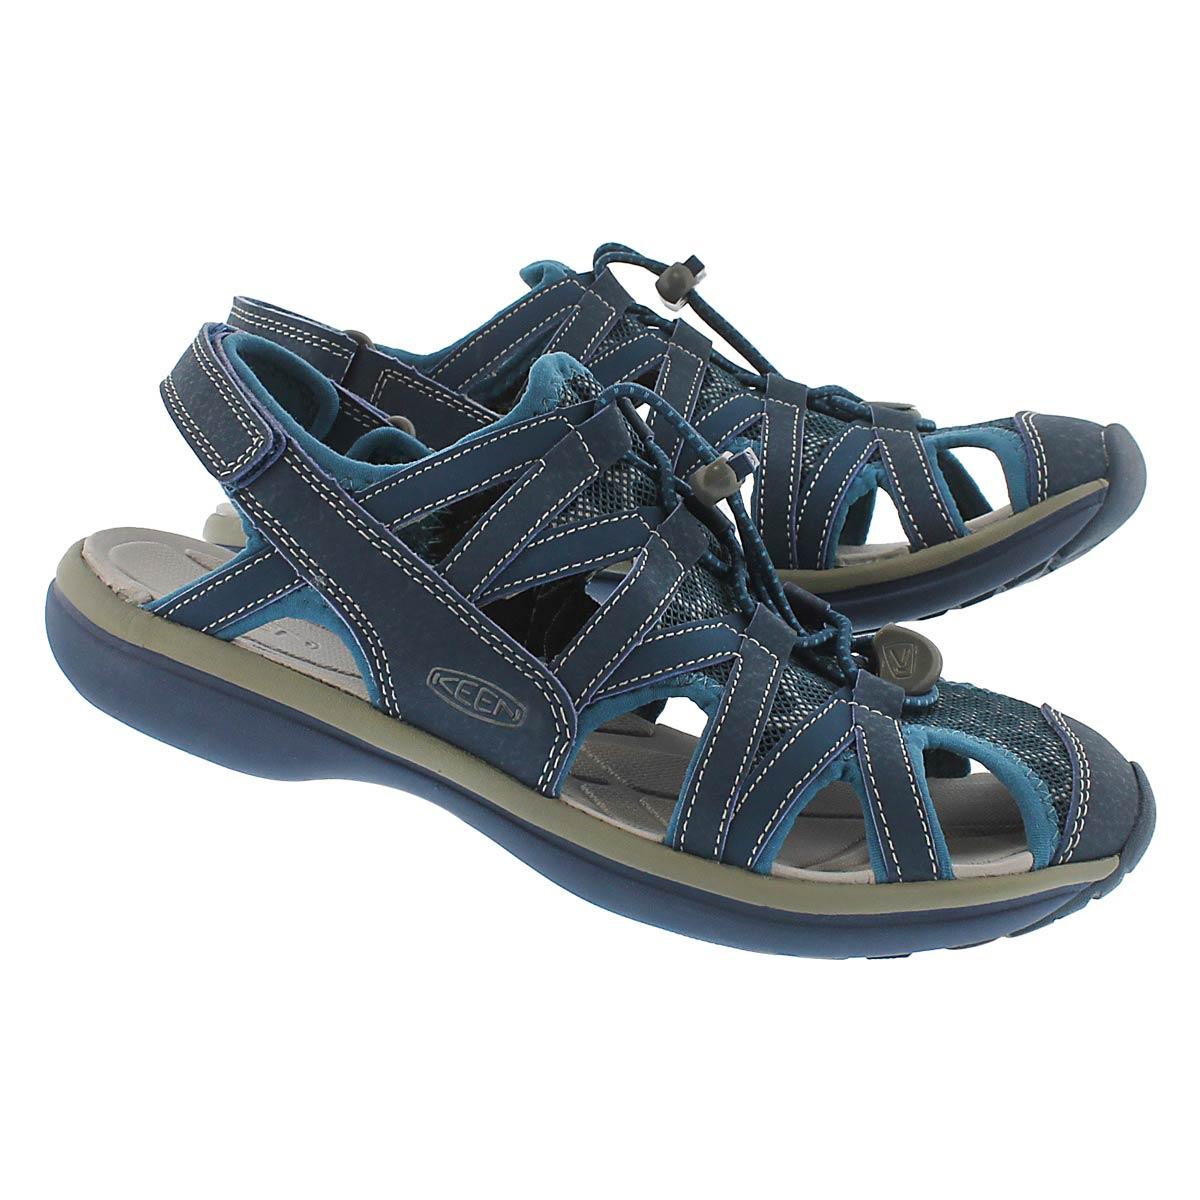 Lds Sage poseidon sport sandal